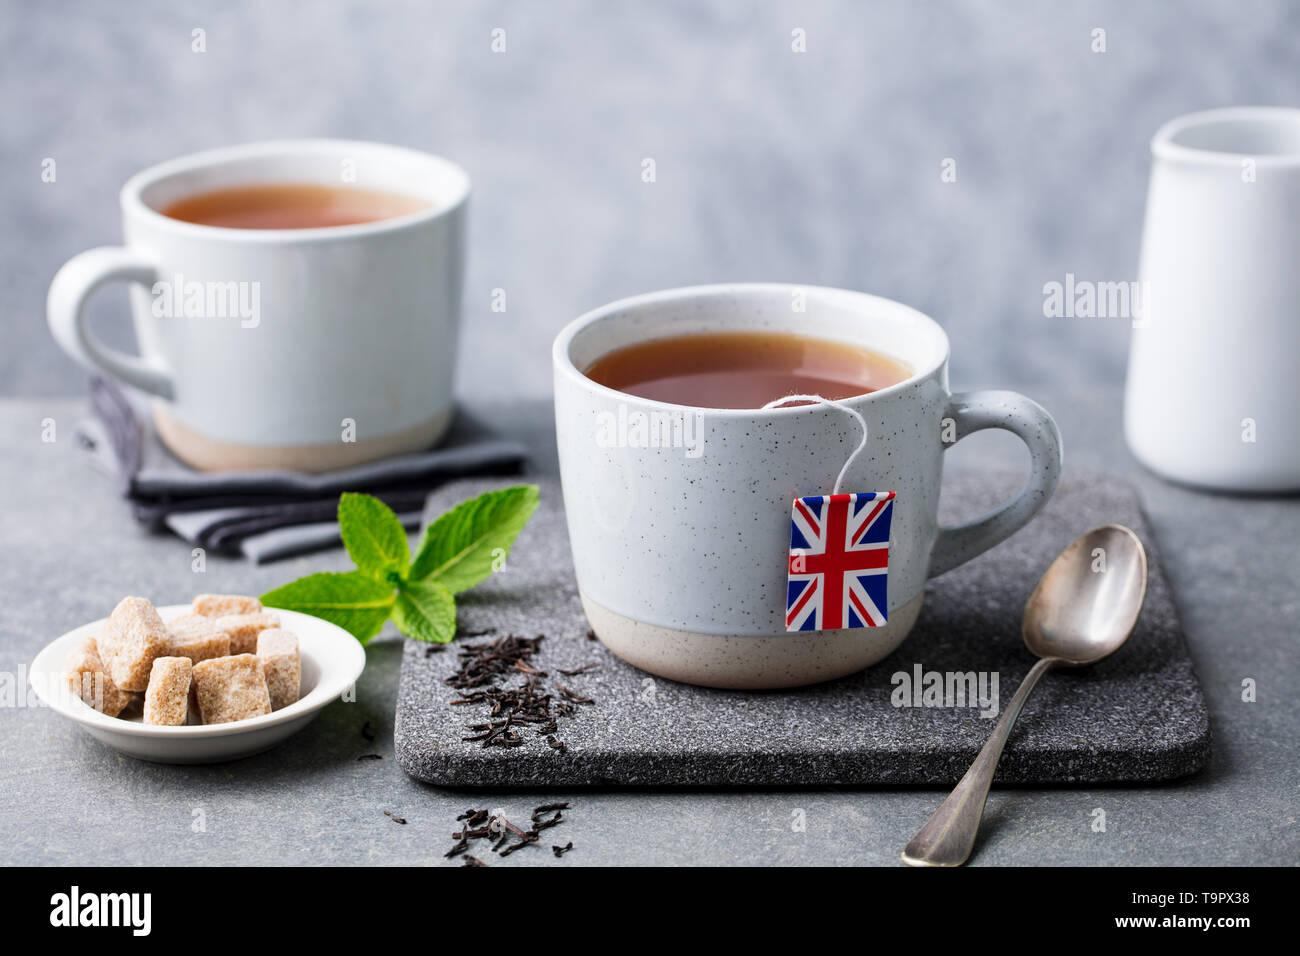 Tea in mugs with British flag tea bag label. Grey background. Close up. - Stock Image